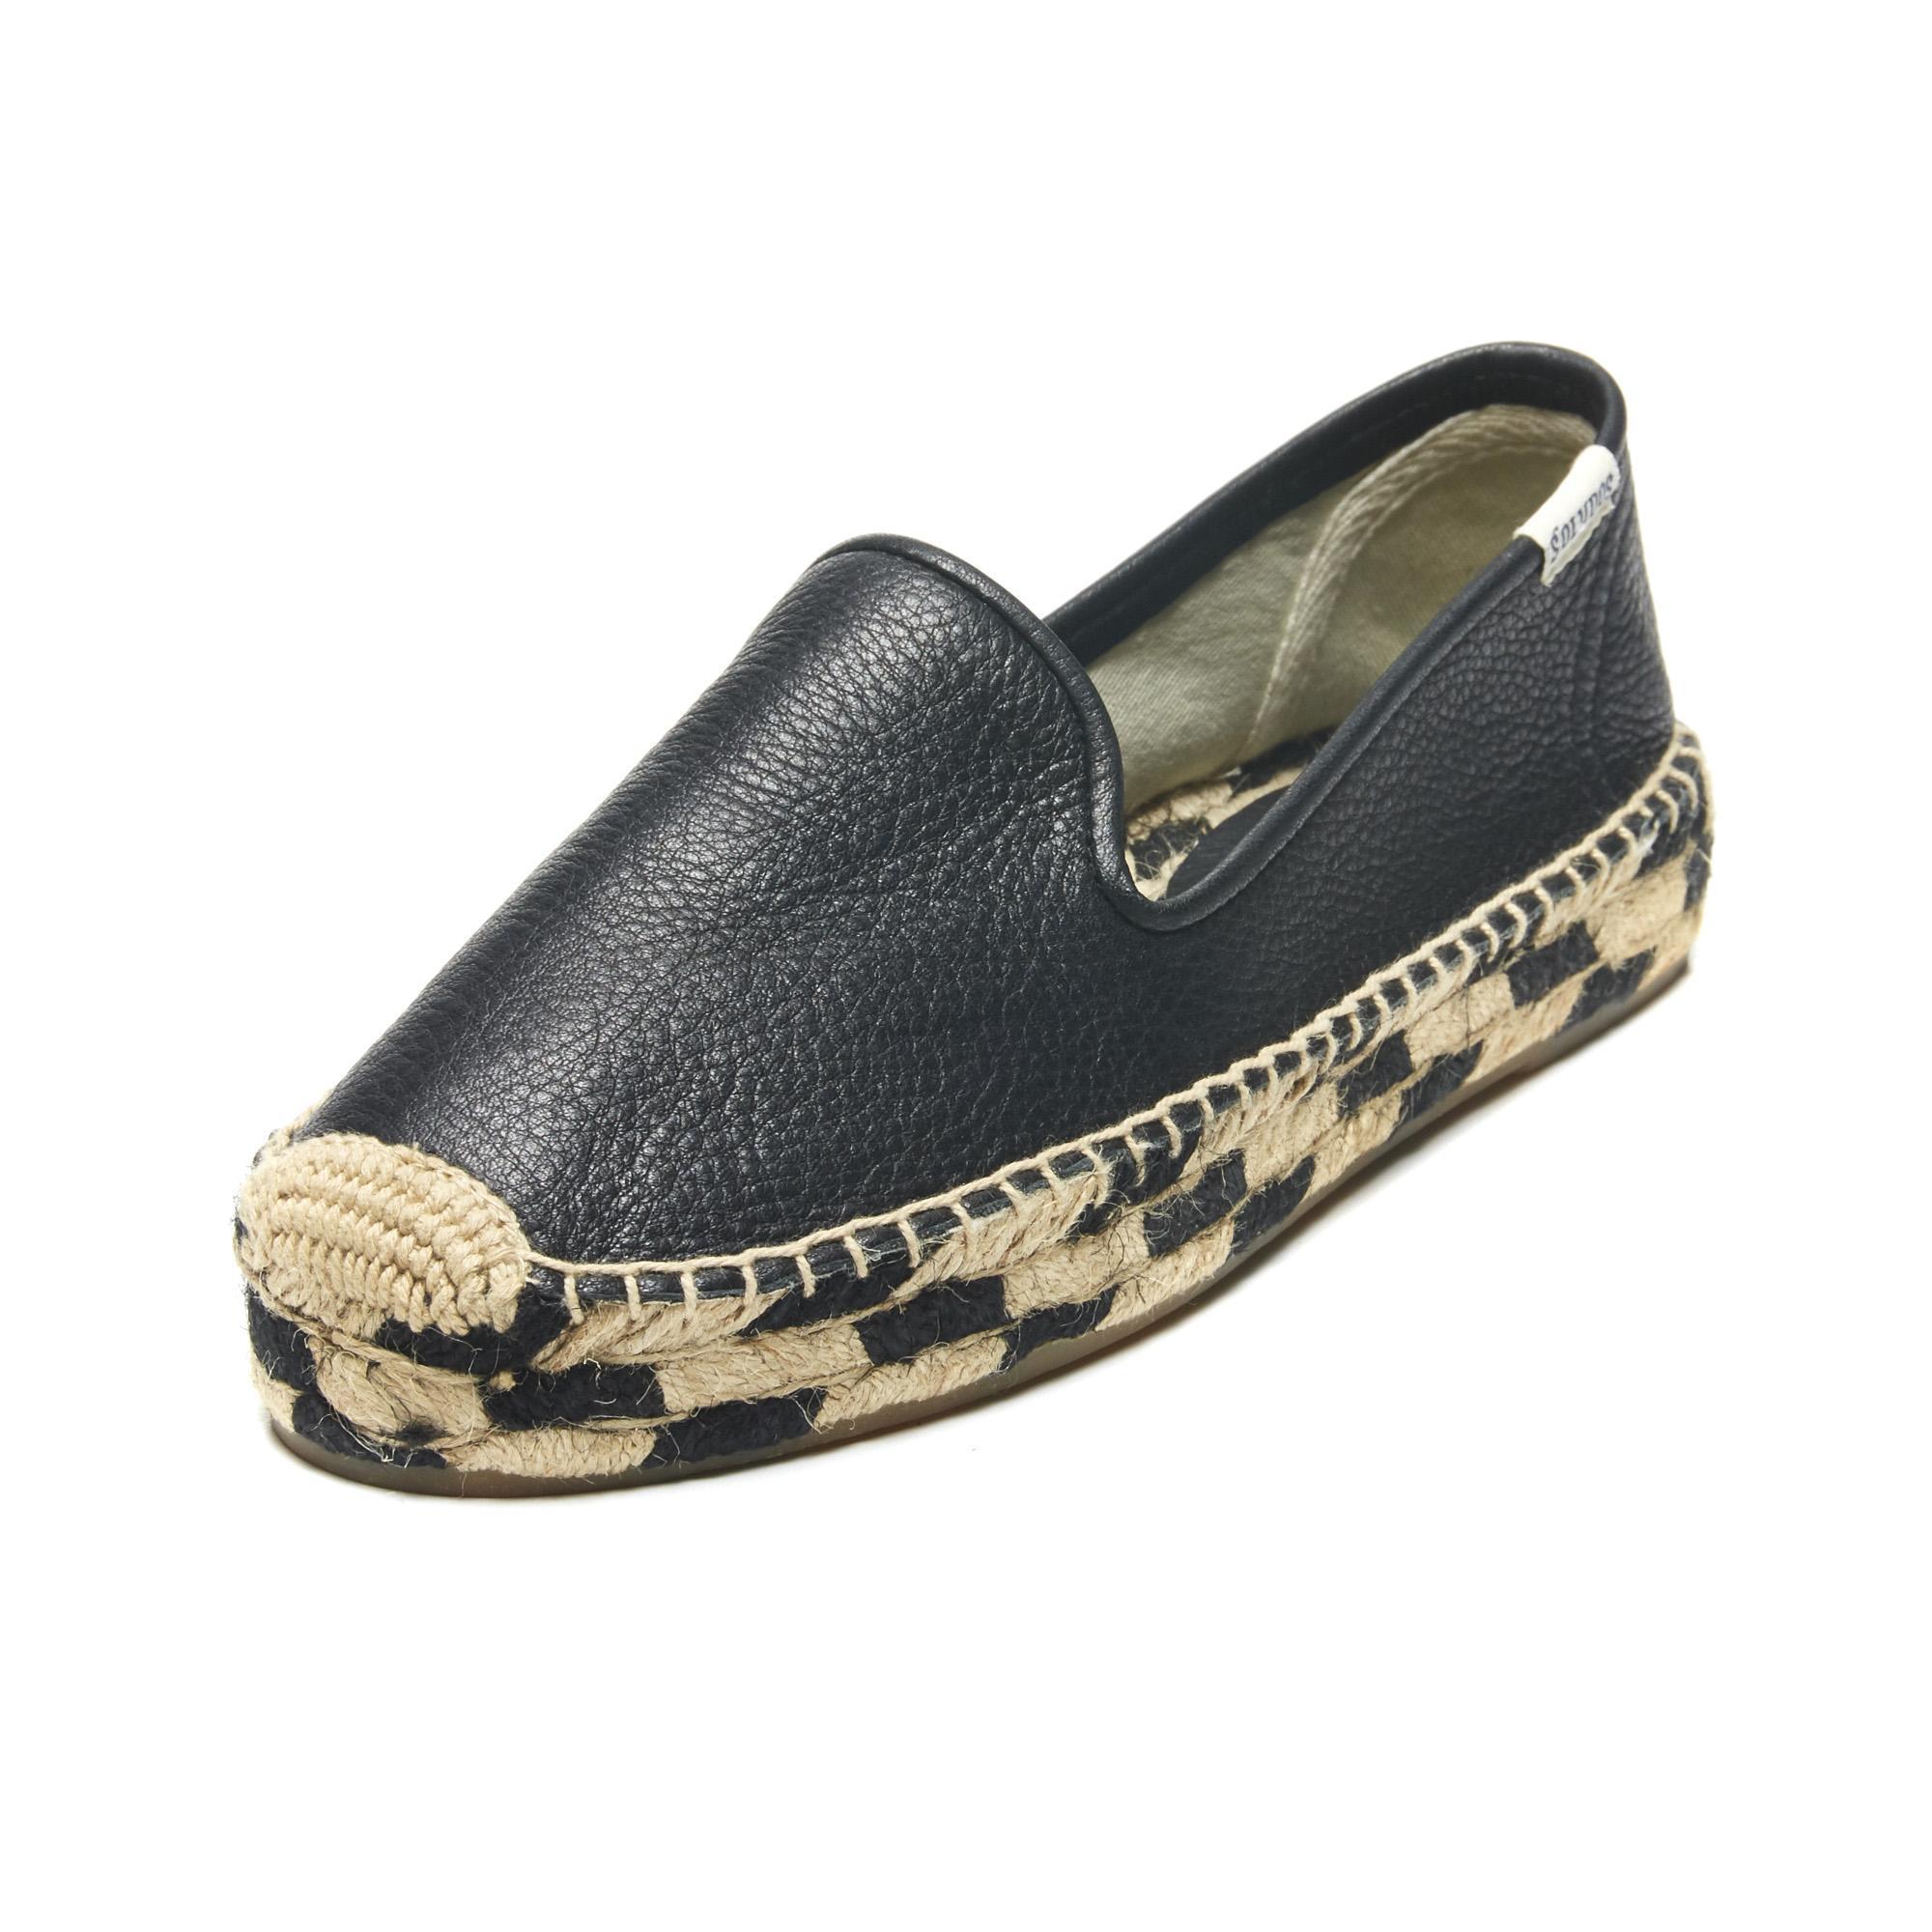 Lyst Soludos Leather Zebra Jute Platform Smoking Slipper